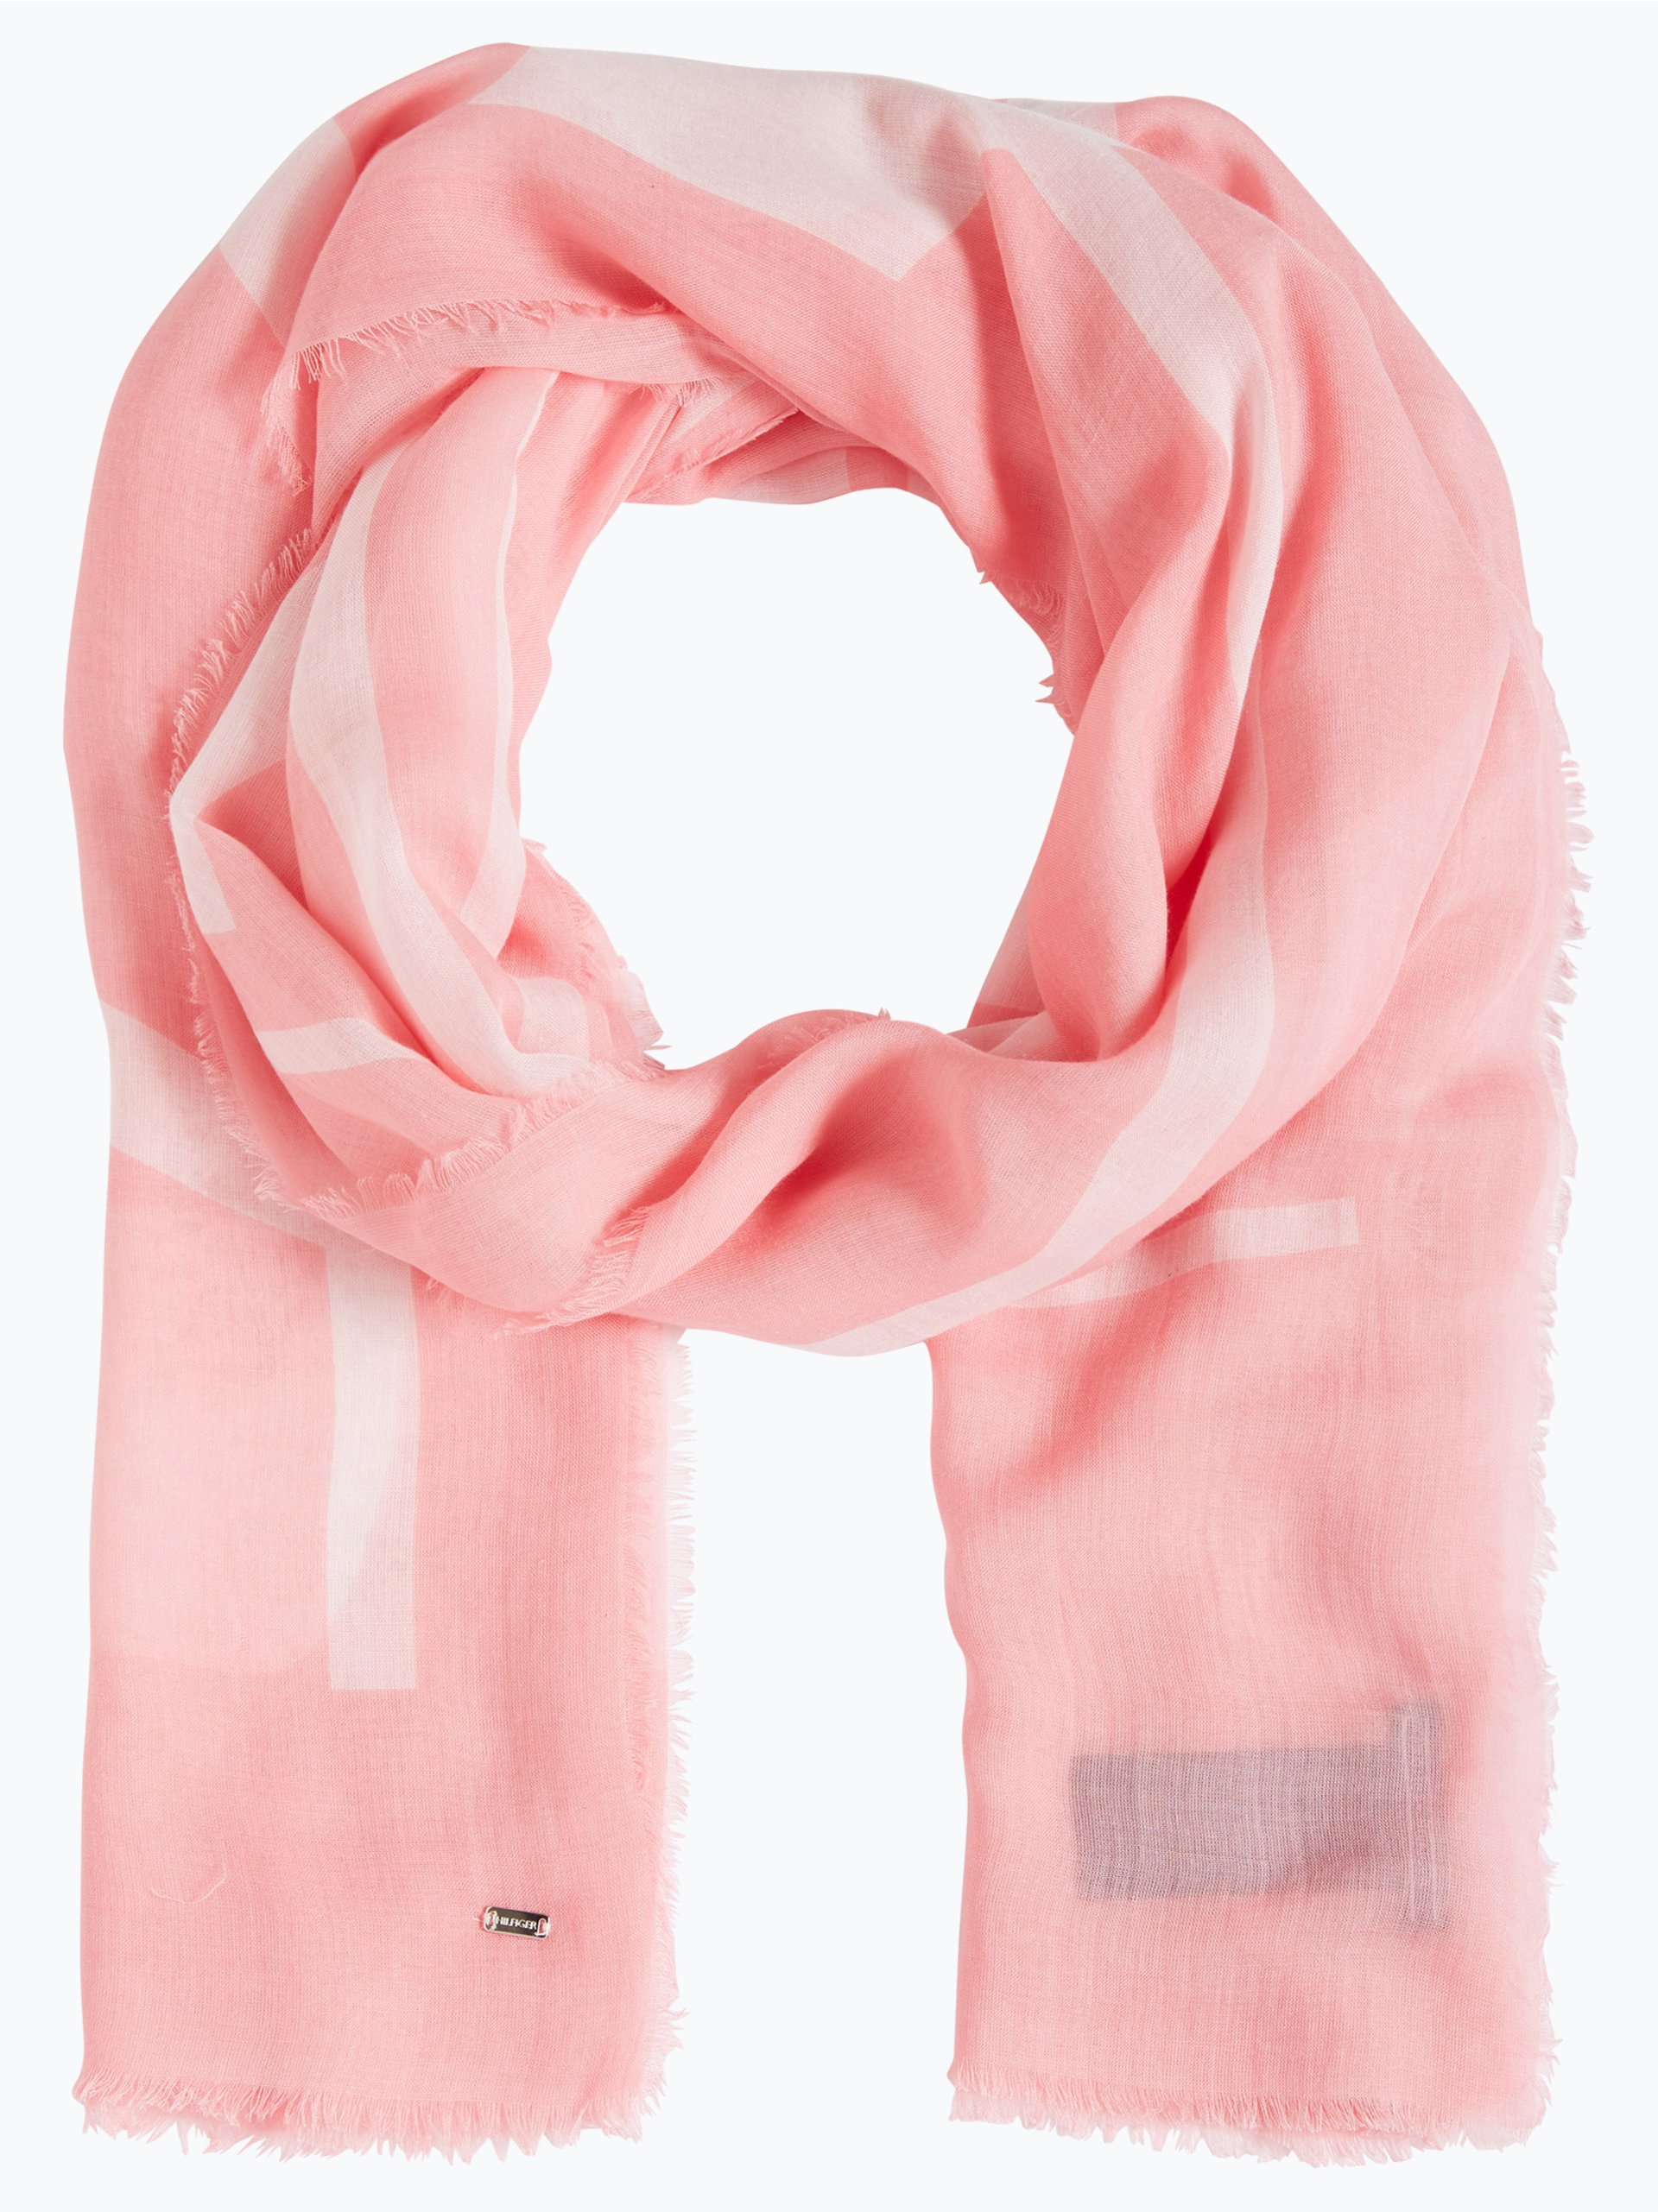 tommy hilfiger damen schal pippa rosa gemustert online. Black Bedroom Furniture Sets. Home Design Ideas